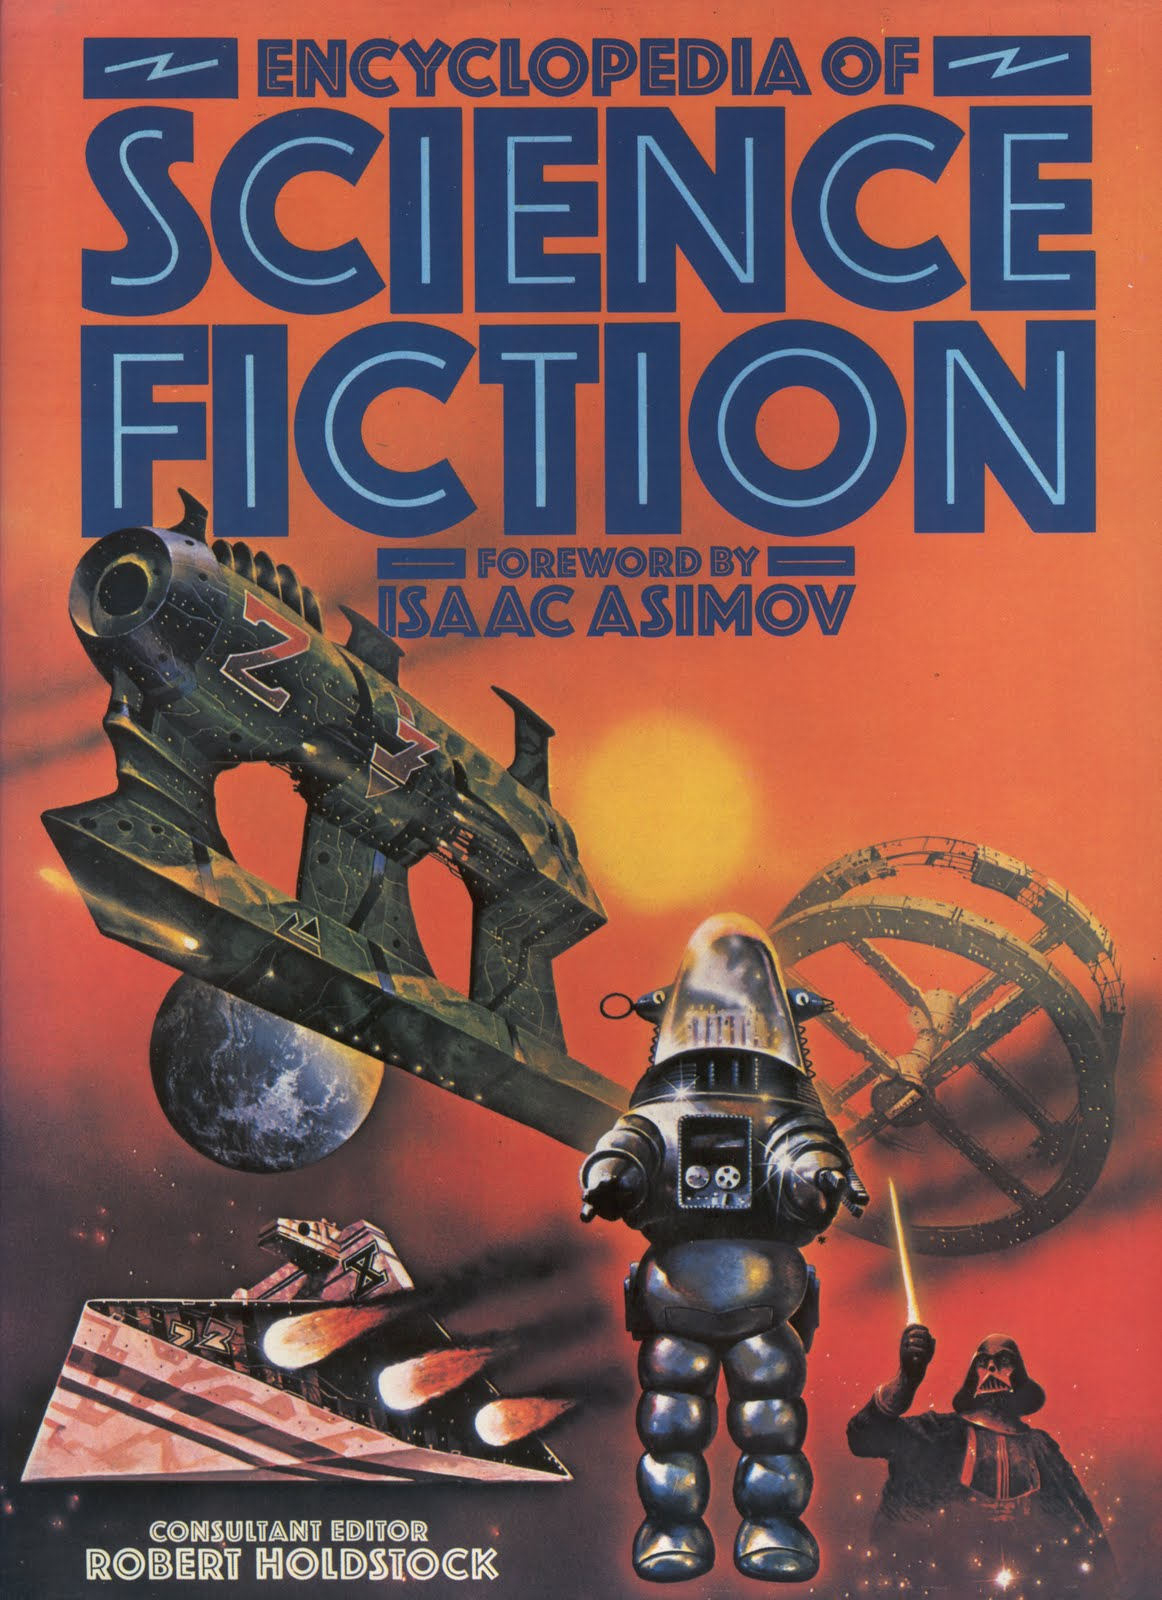 3343 best Future / SciFi images on Pinterest | Science ... |Science Fiction Graphics